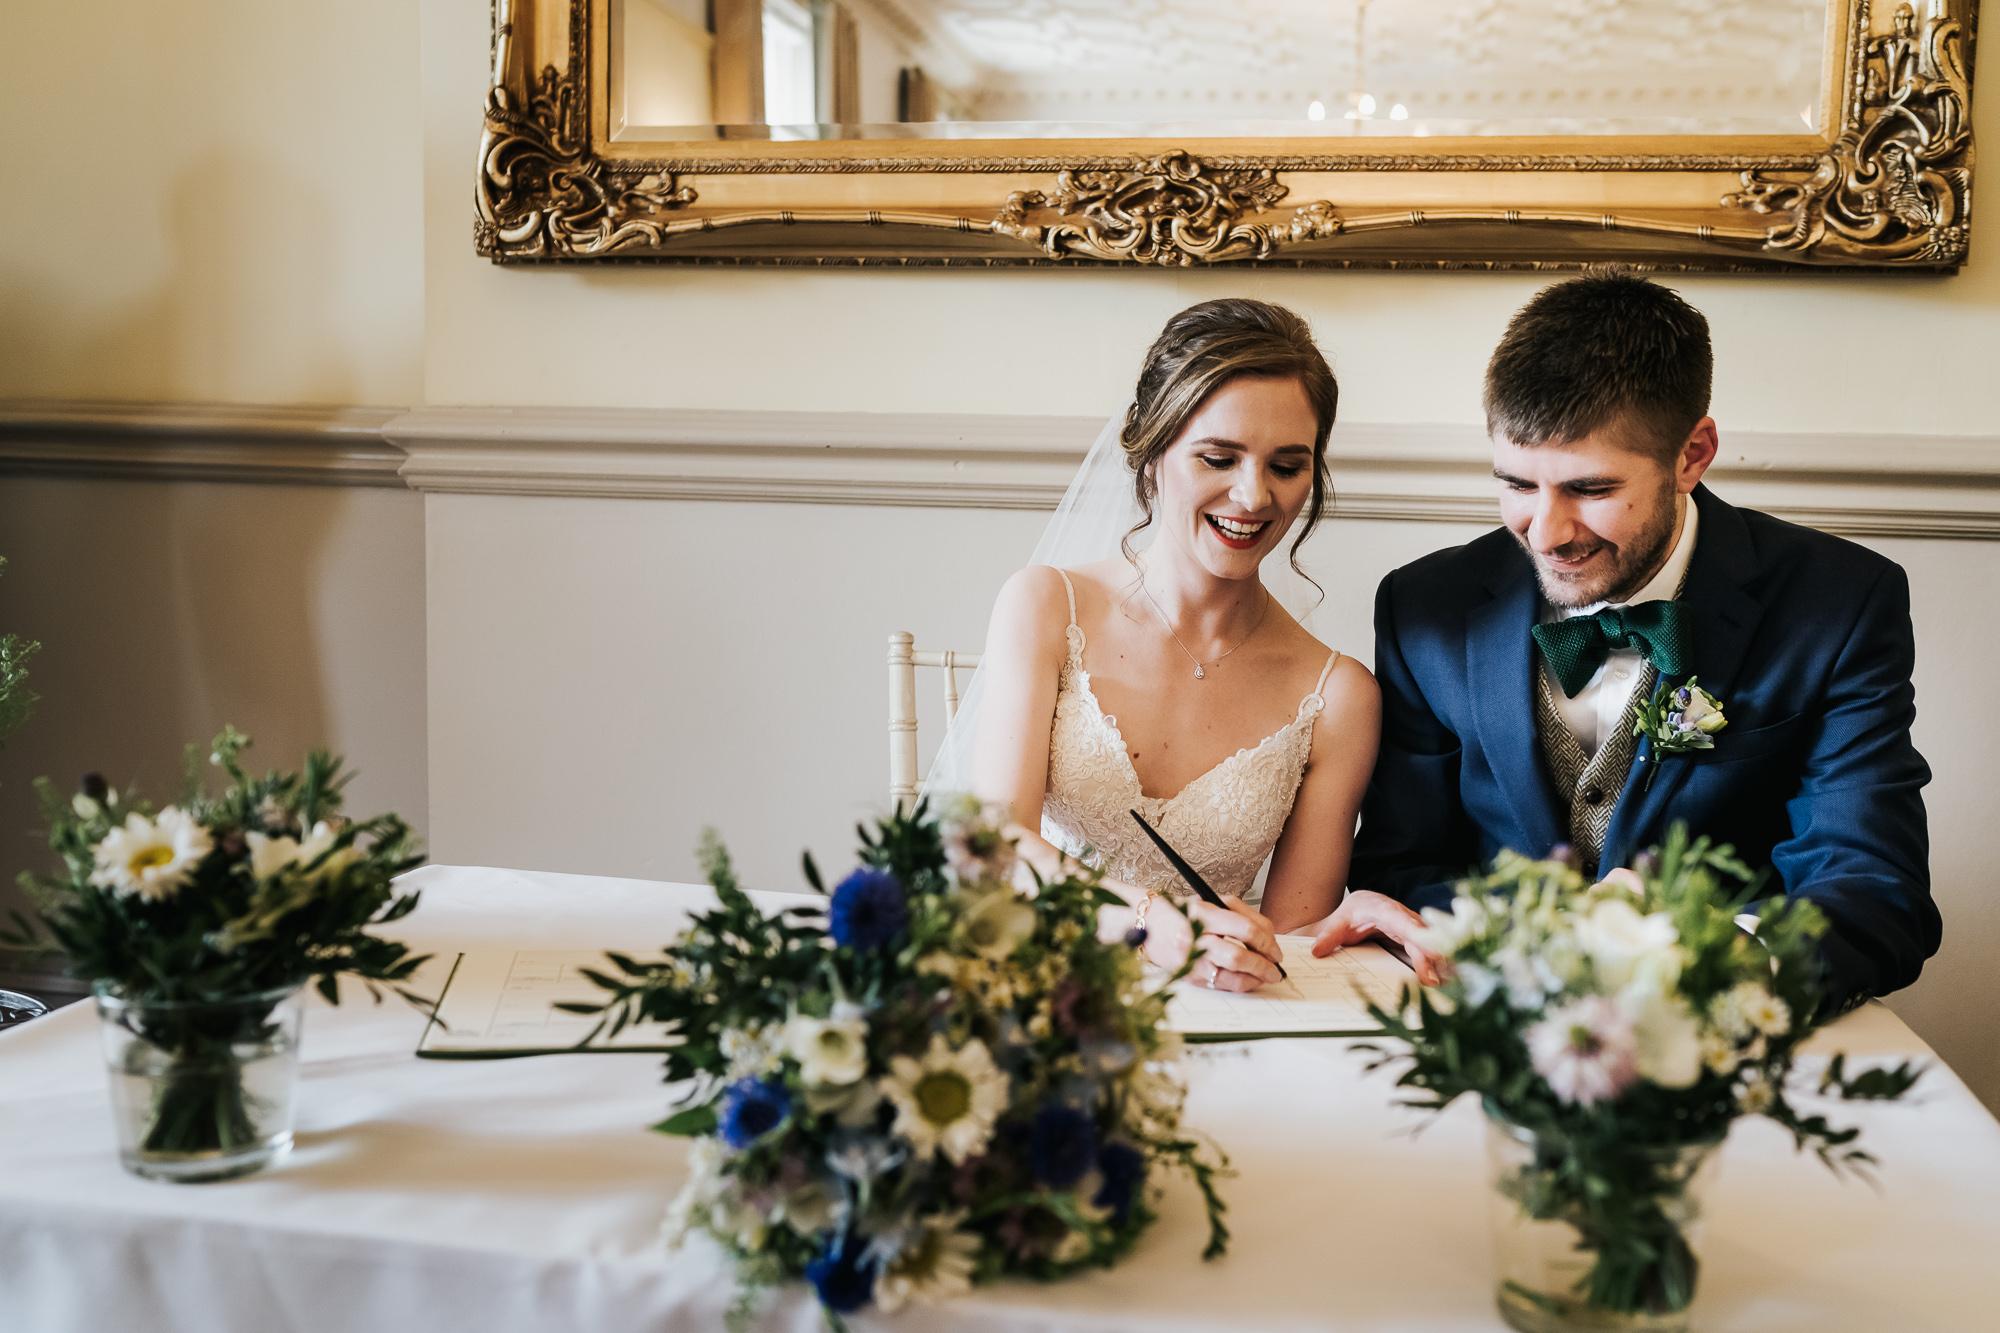 Nunsmere Hall Hotel Wedding photograhpy in cheshire wedding photographer (20 of 42).jpg